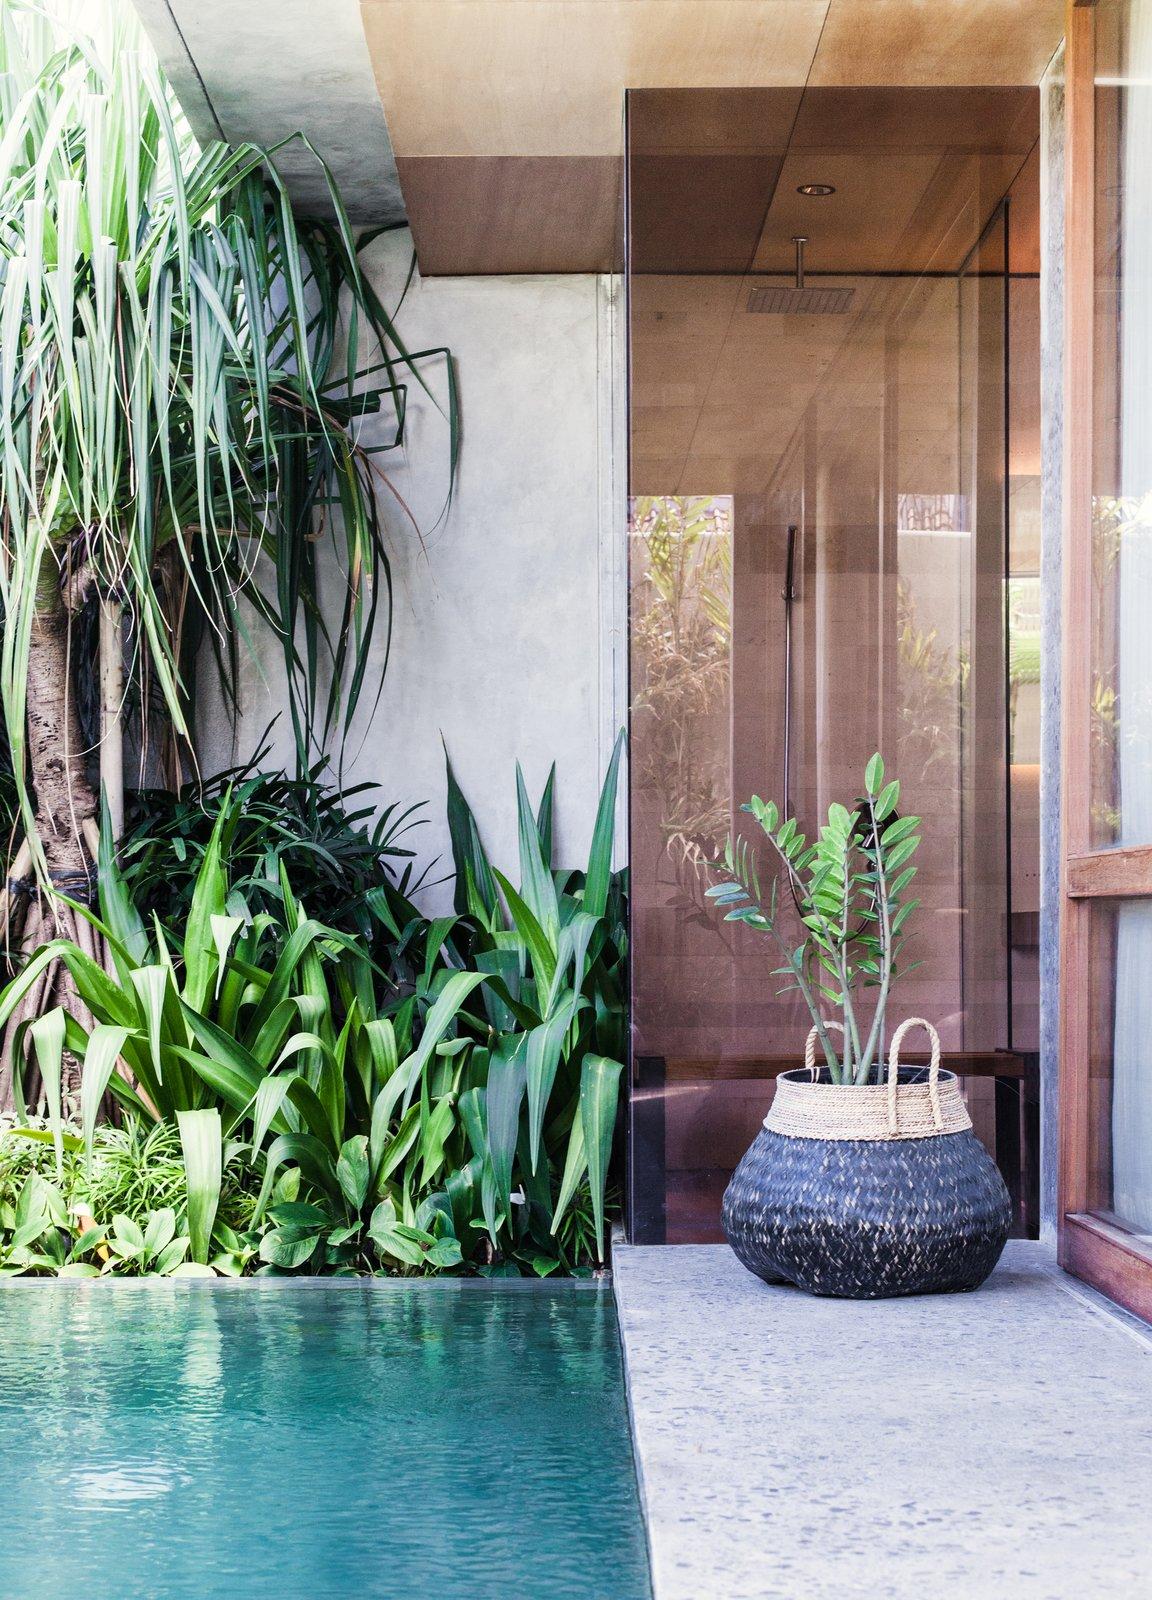 Photo 10 of 12 in Go Beyond the Basics in an Australian Fashion Designer's Surf-Inspired Bali Hotel